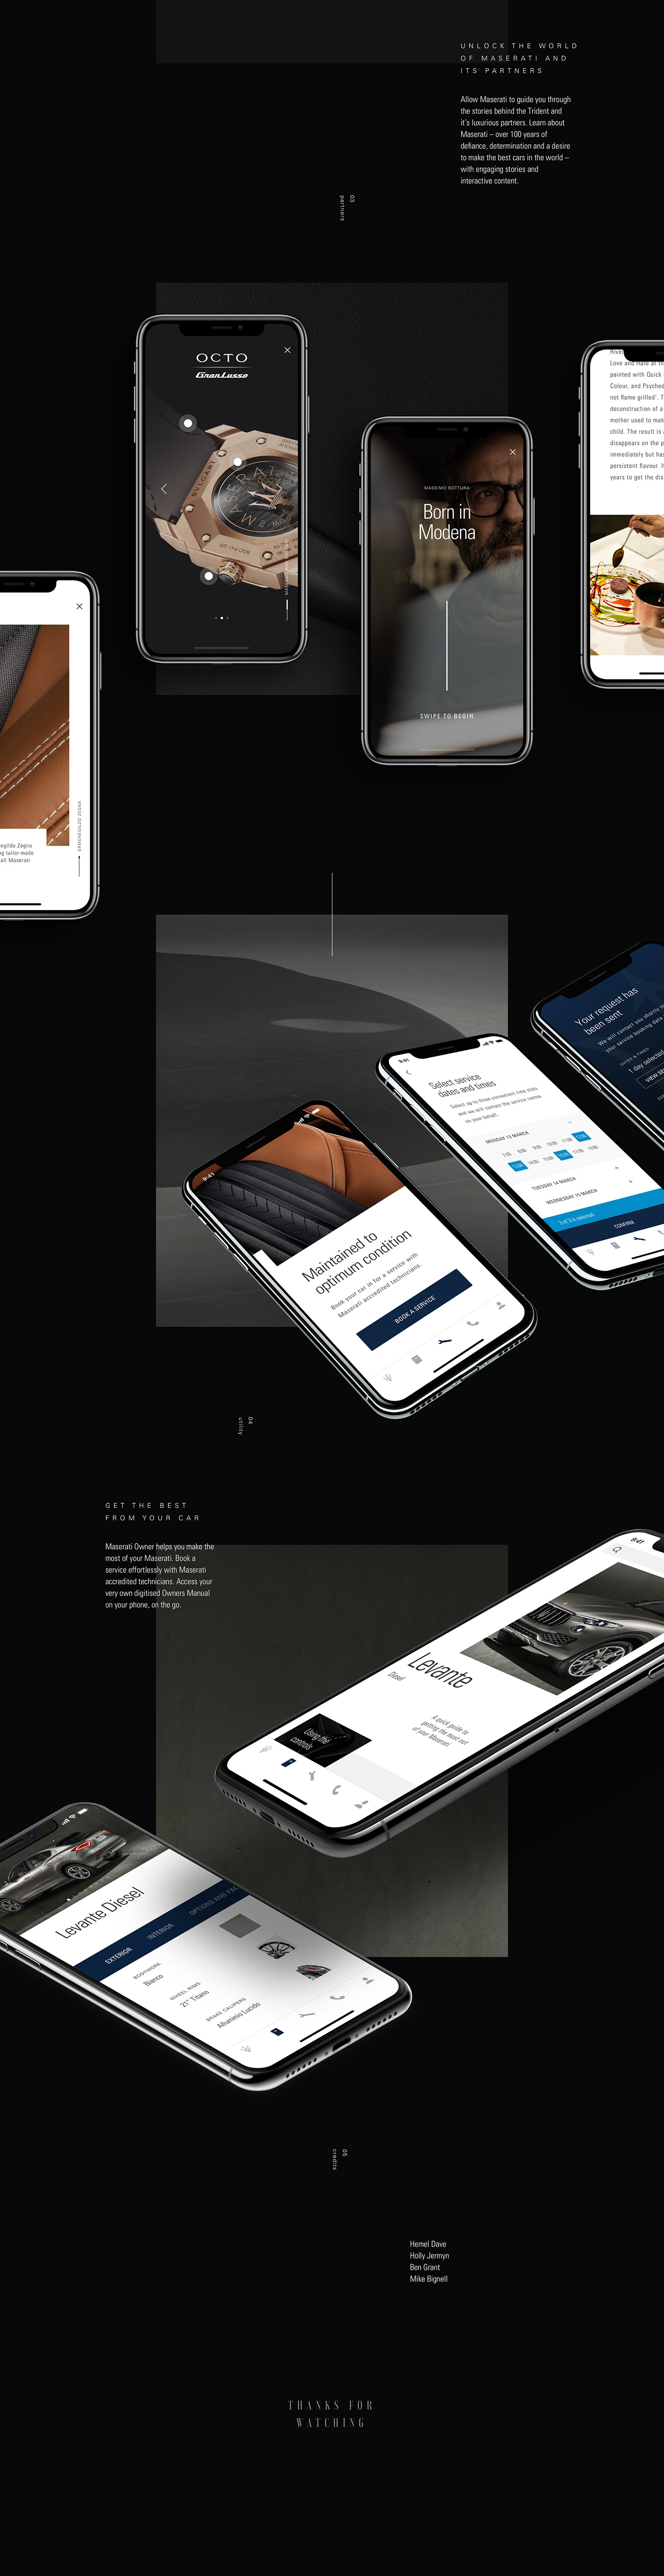 app automotive   car UI/UX automobile application ios design animation  interaction